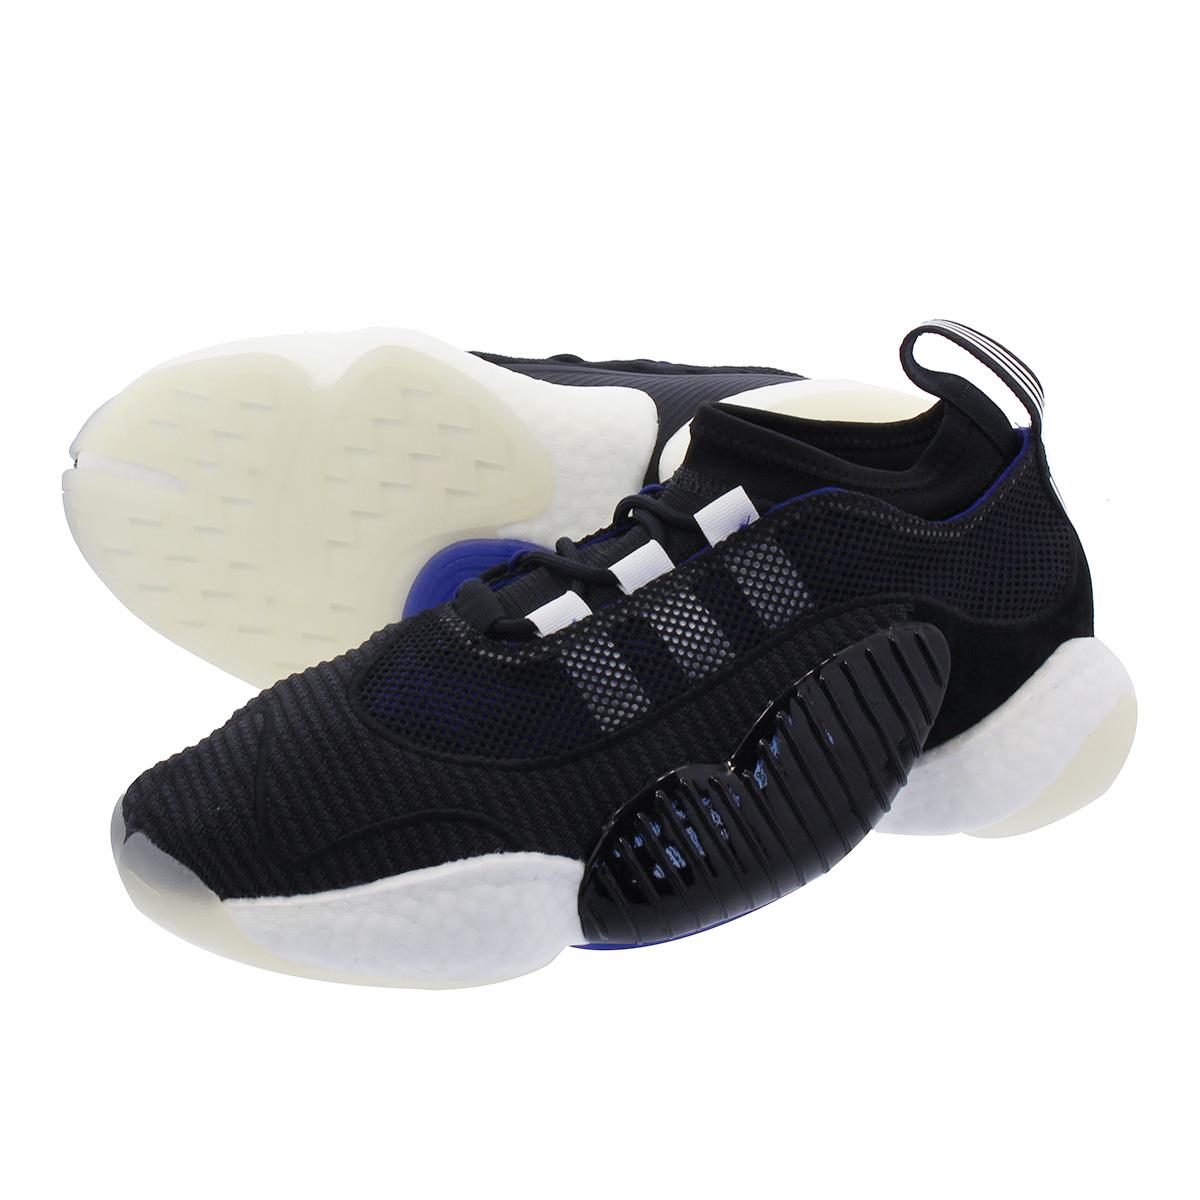 de955319b56 LOWTEX PLUS  adidas CRAZY BYW LVL II Adidas crazy BYW LVL II  BLACK PURPLE WHITE b37552